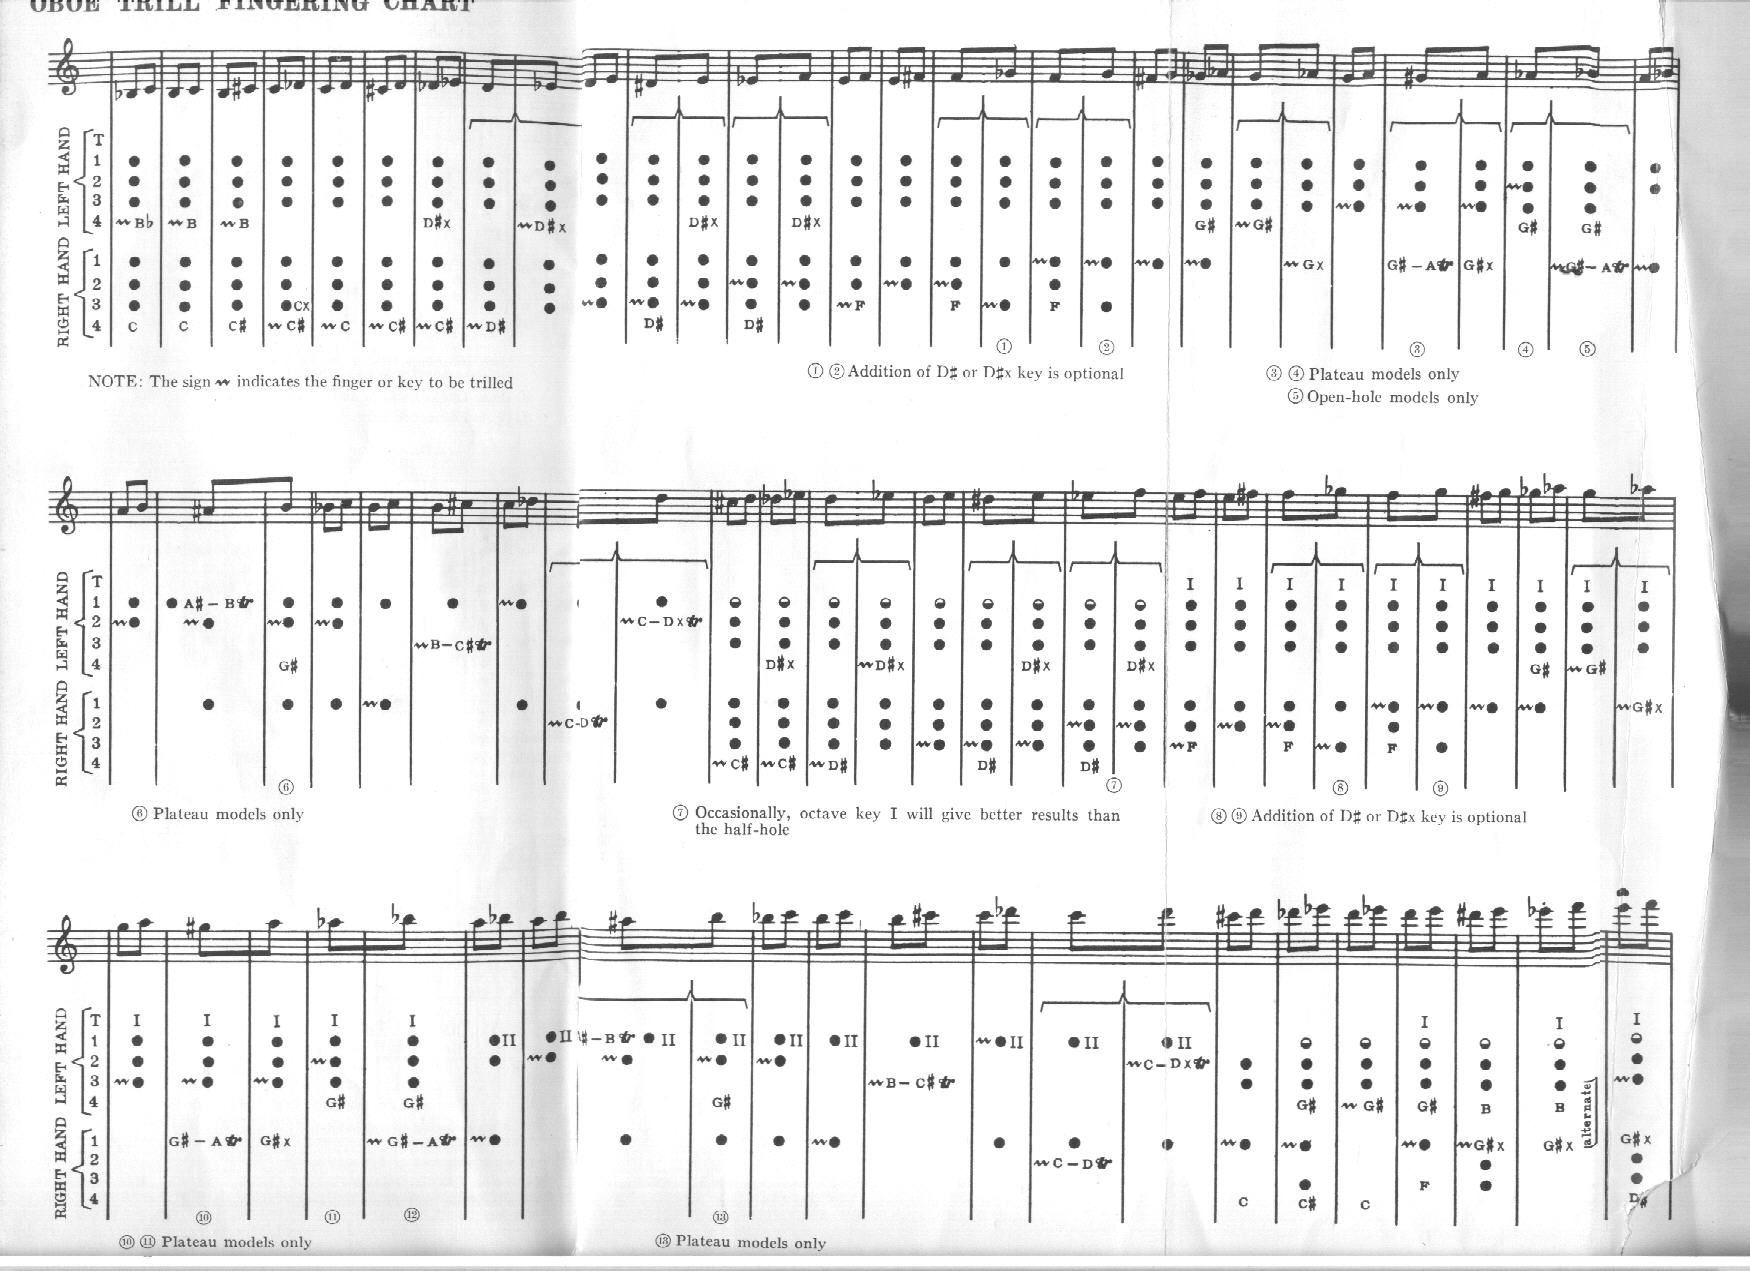 oboe trill chart - Mersn.proforum.co